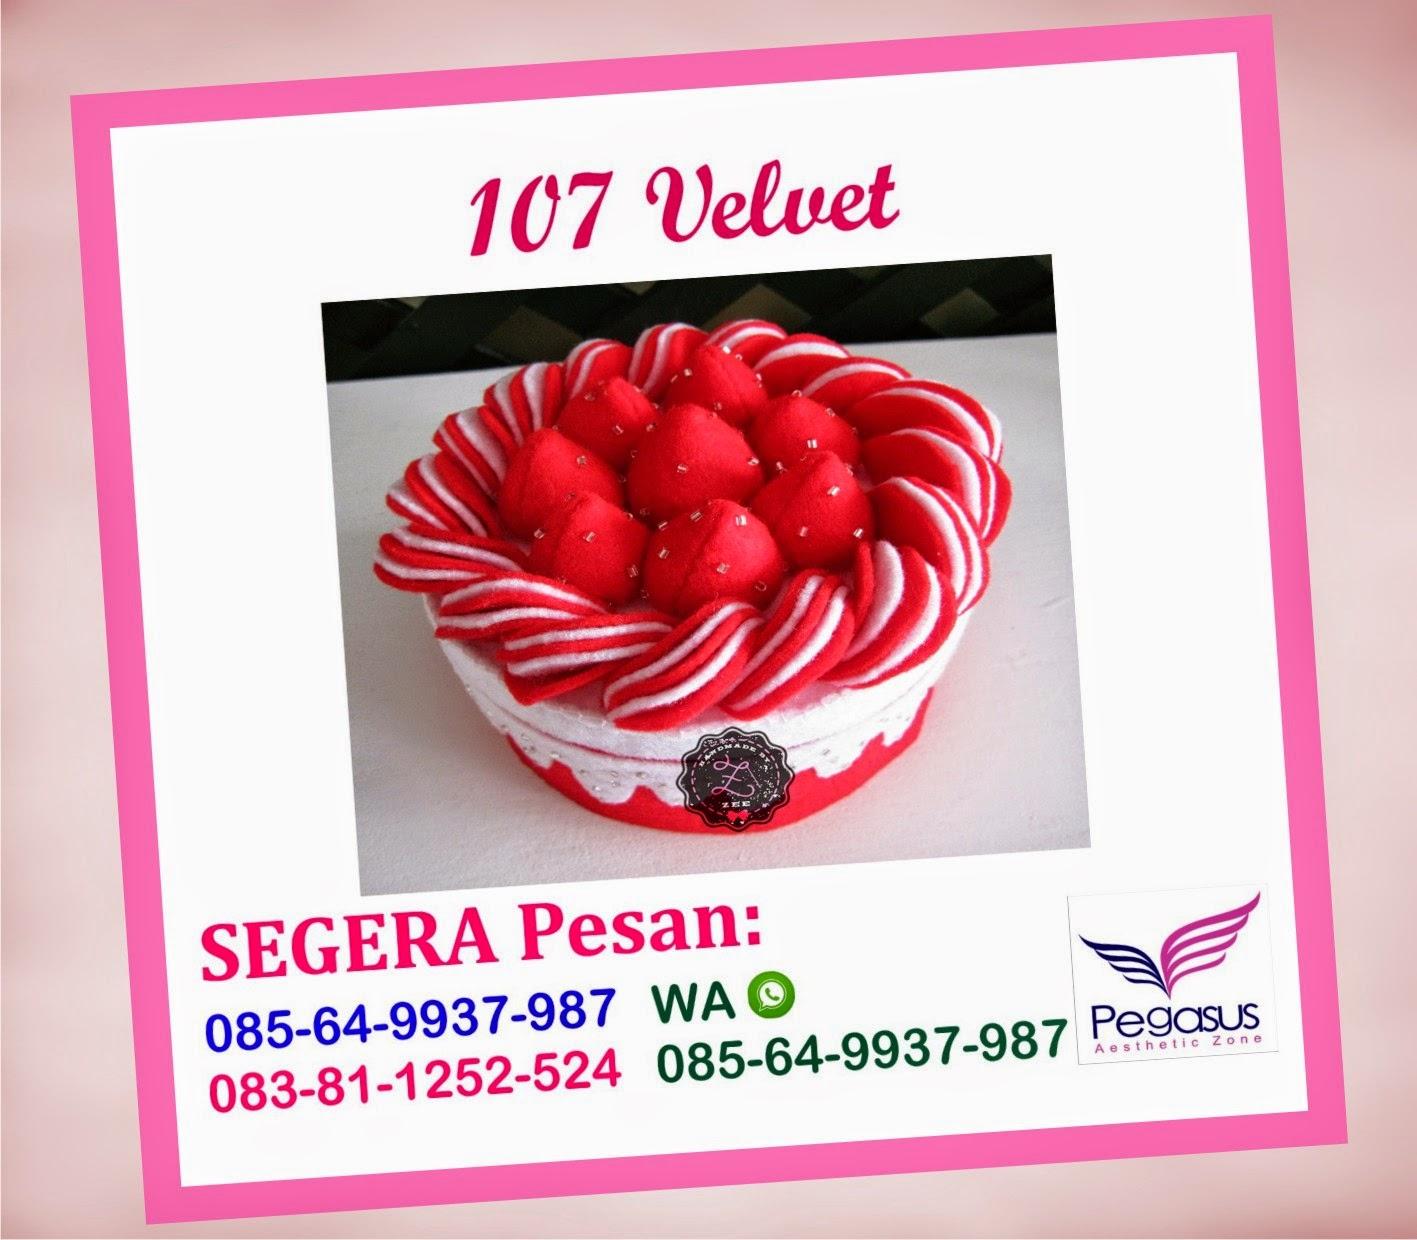 Souvenir Pernikahan, Toples Flanel Cake, Toples Flanel Cantik, +62.8564.993.7987